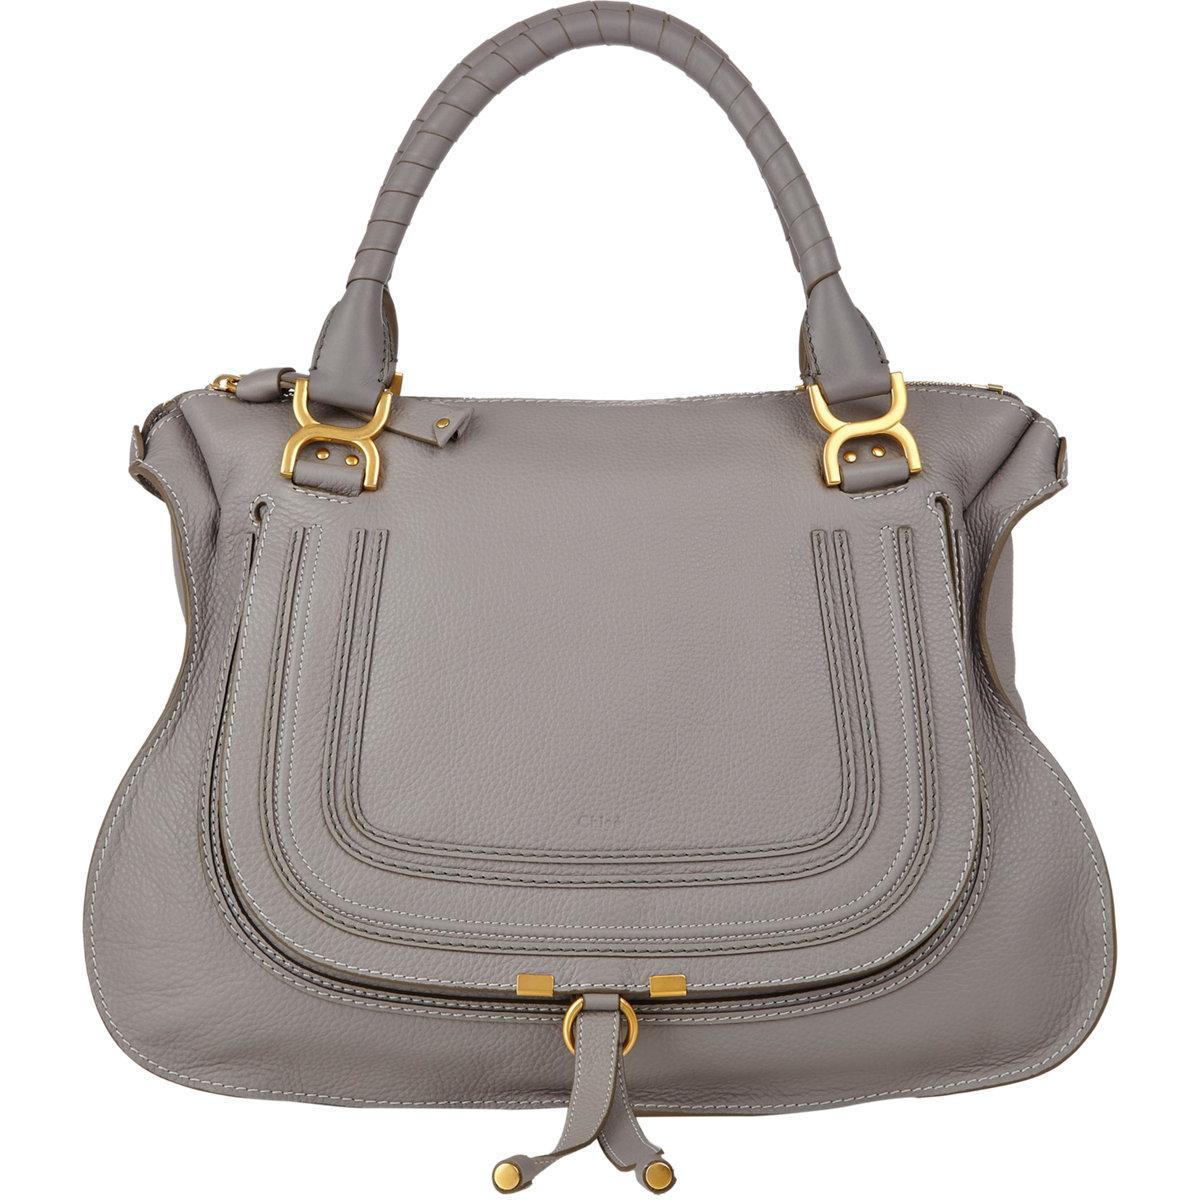 chlo marcie large satchel in gray lyst. Black Bedroom Furniture Sets. Home Design Ideas